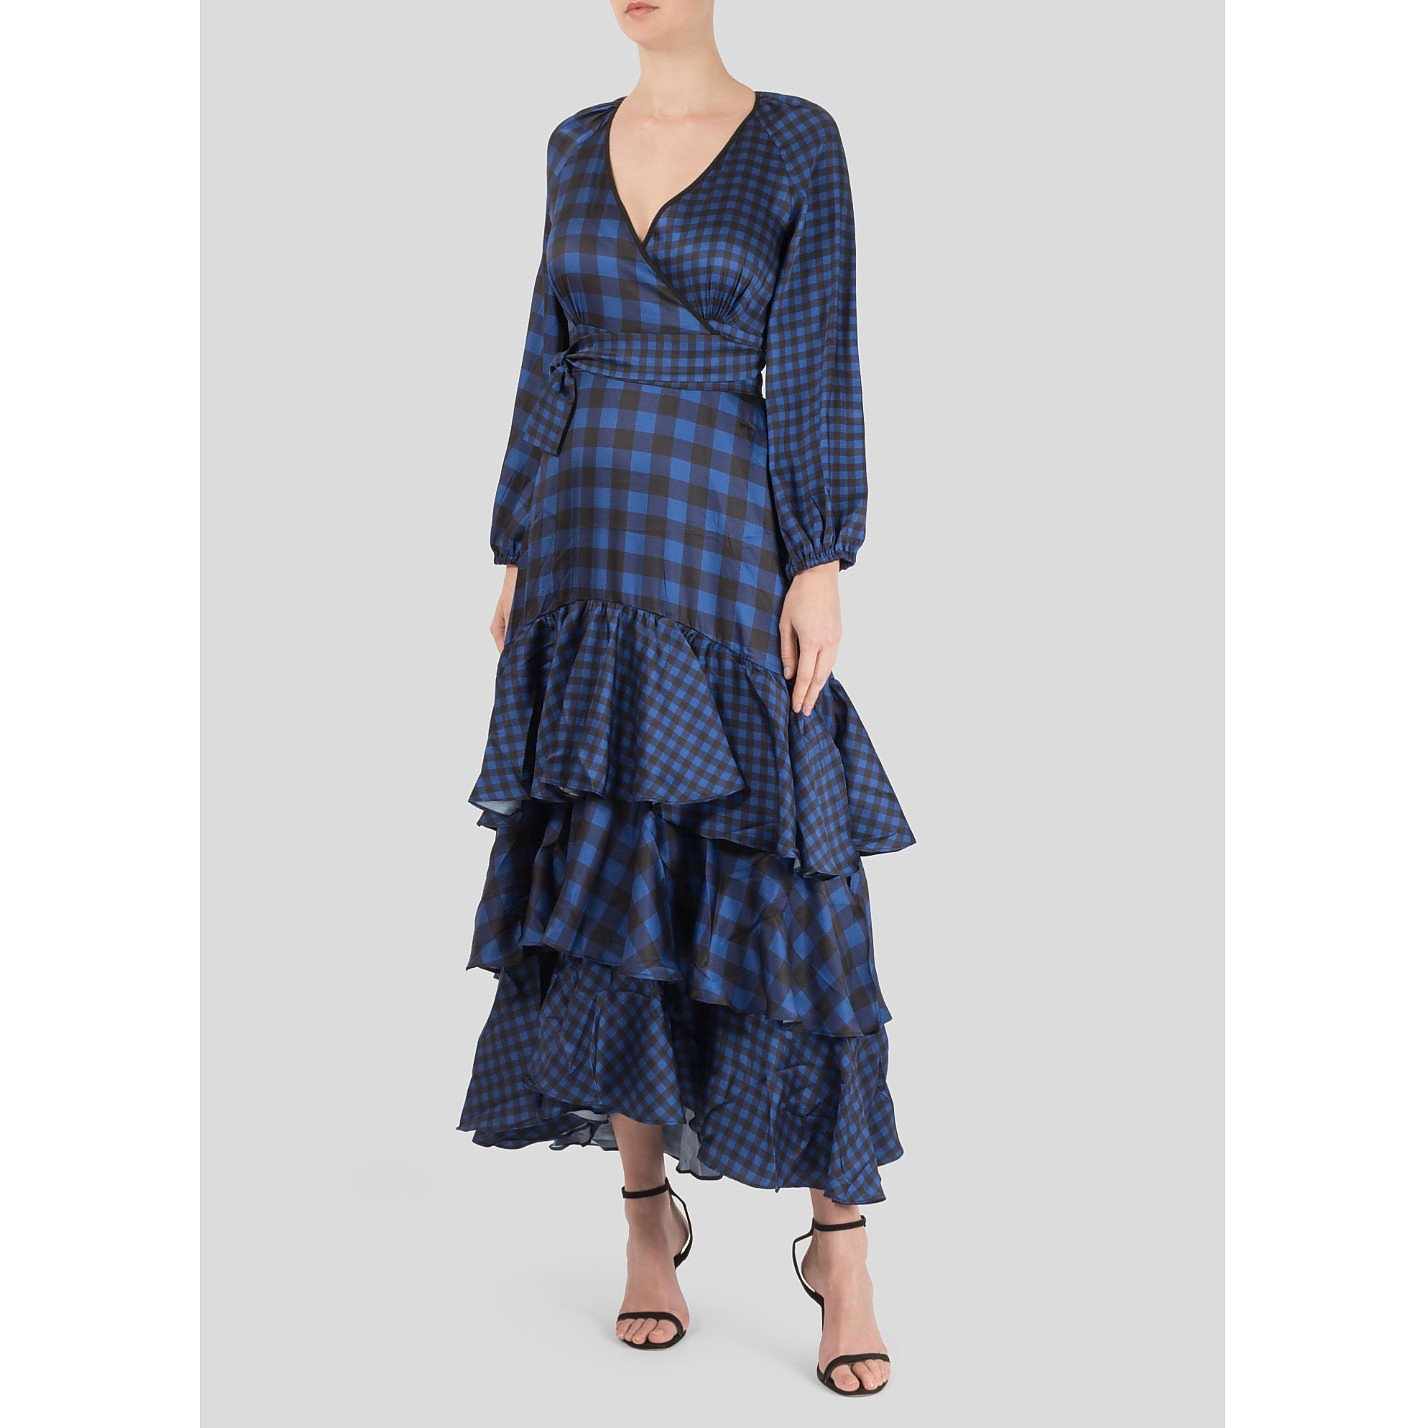 Paper London Neli Gingham Dress